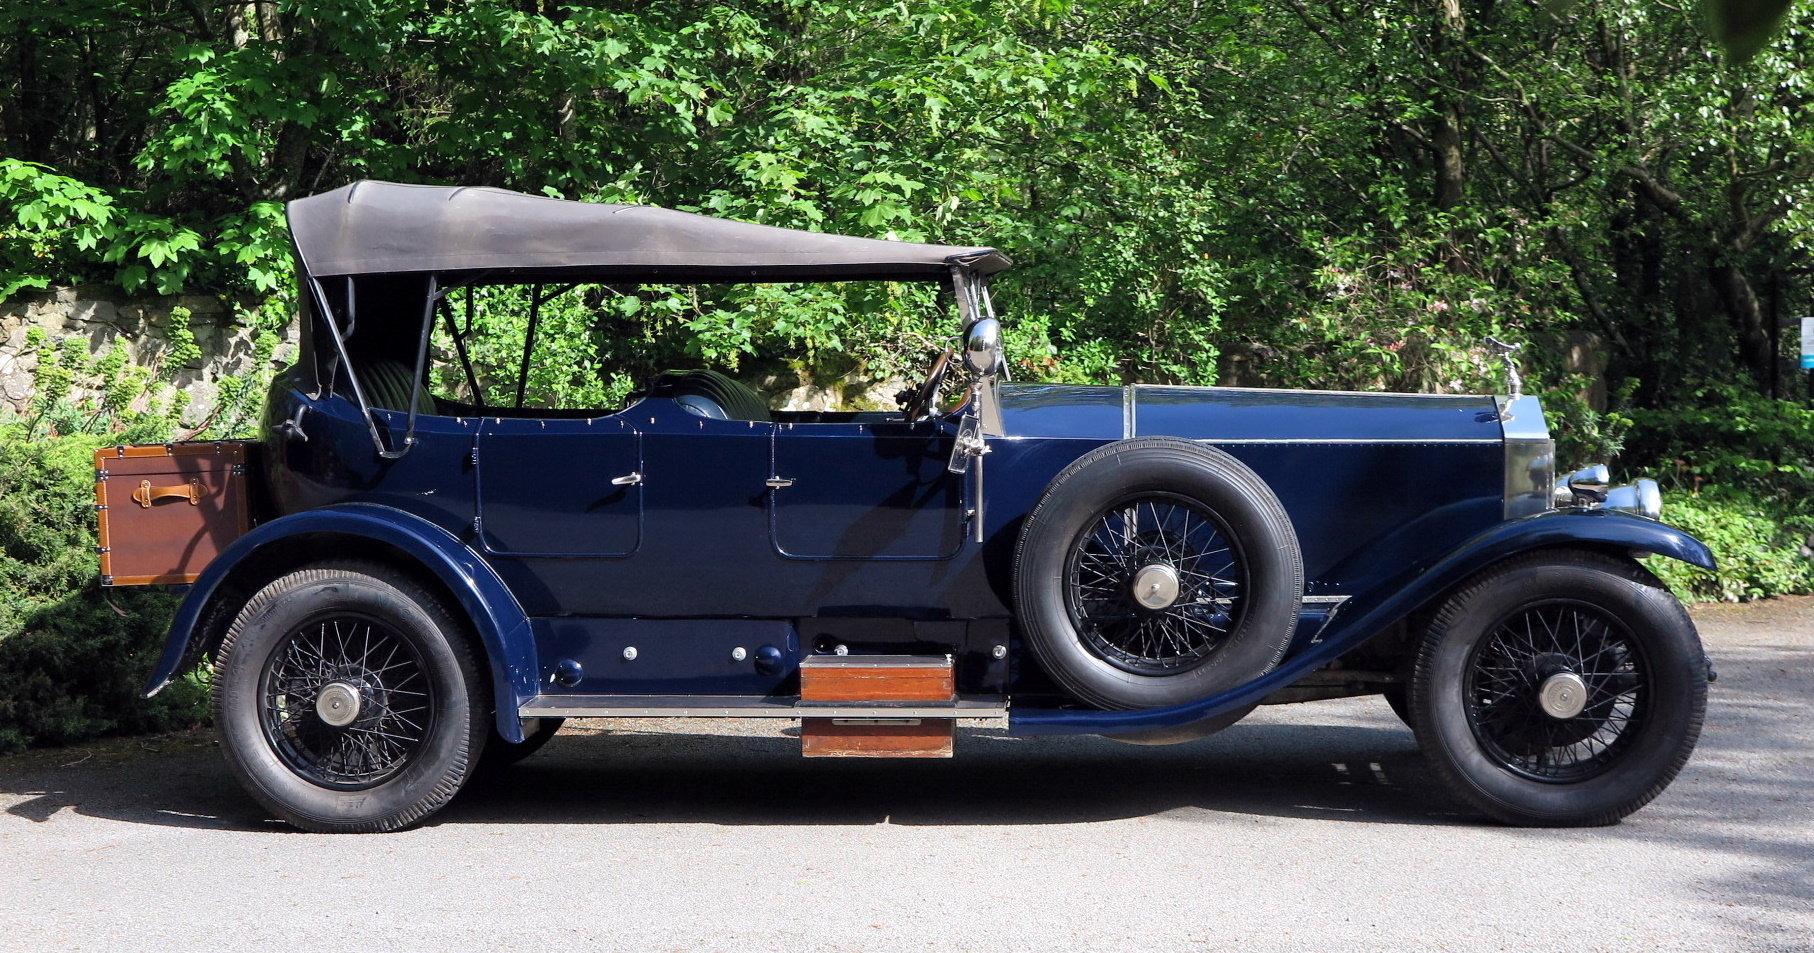 1926 Rolls-Royce Phantom I Four Door Dual Cowl Tourer 80YC For Sale (picture 3 of 6)